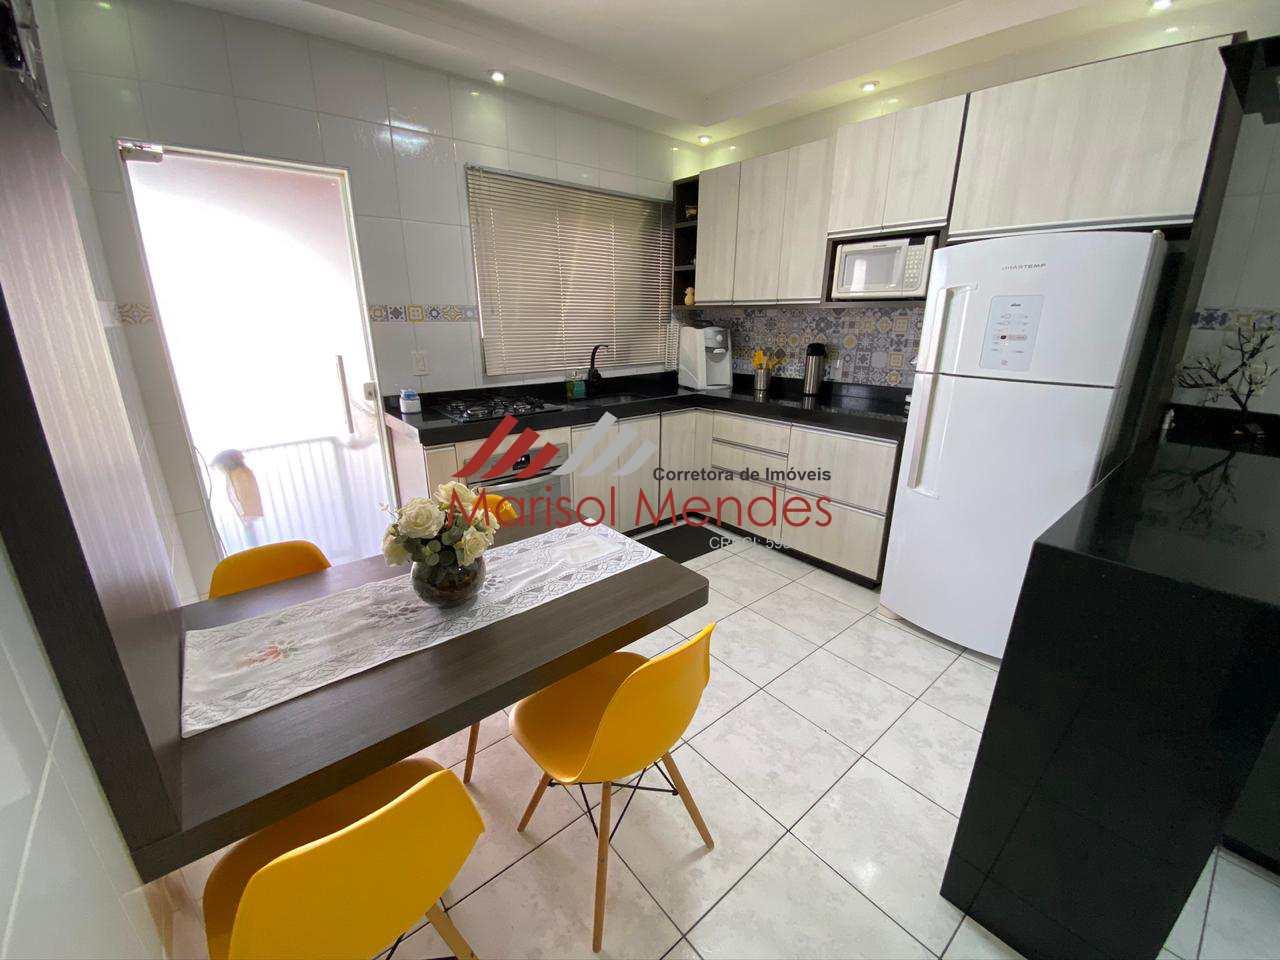 Casa com 2 dorms, Jardim Milenium, Pirassununga - R$ 260 mil, Cod: 129